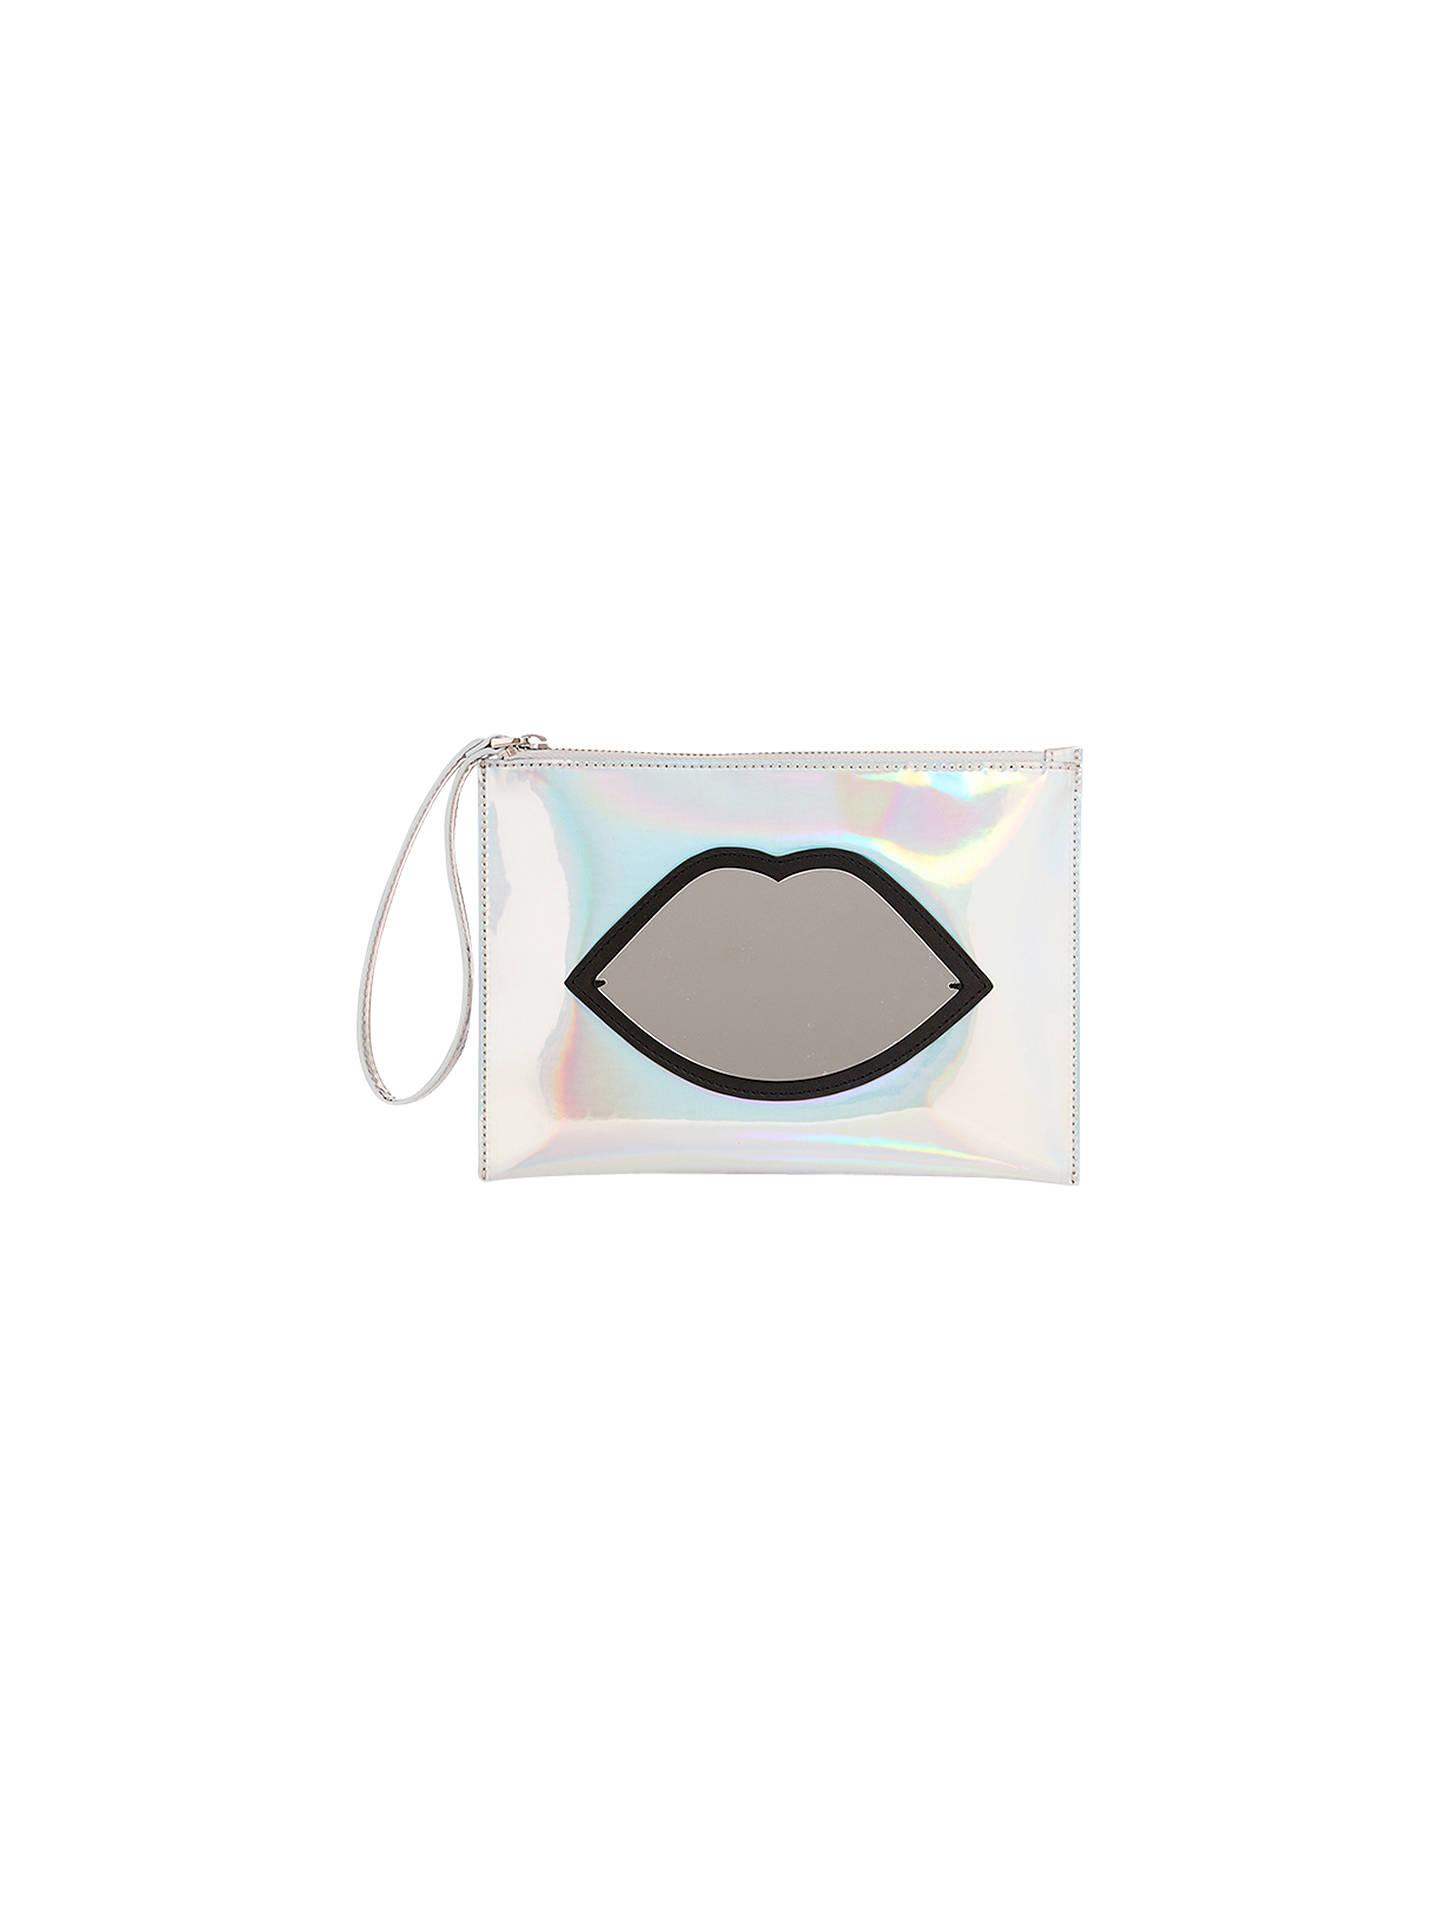 cca8498d3d450 Lulu Guinness Silver Hologram   Mirror Perspex Lips Zip Pouch Clutch ...